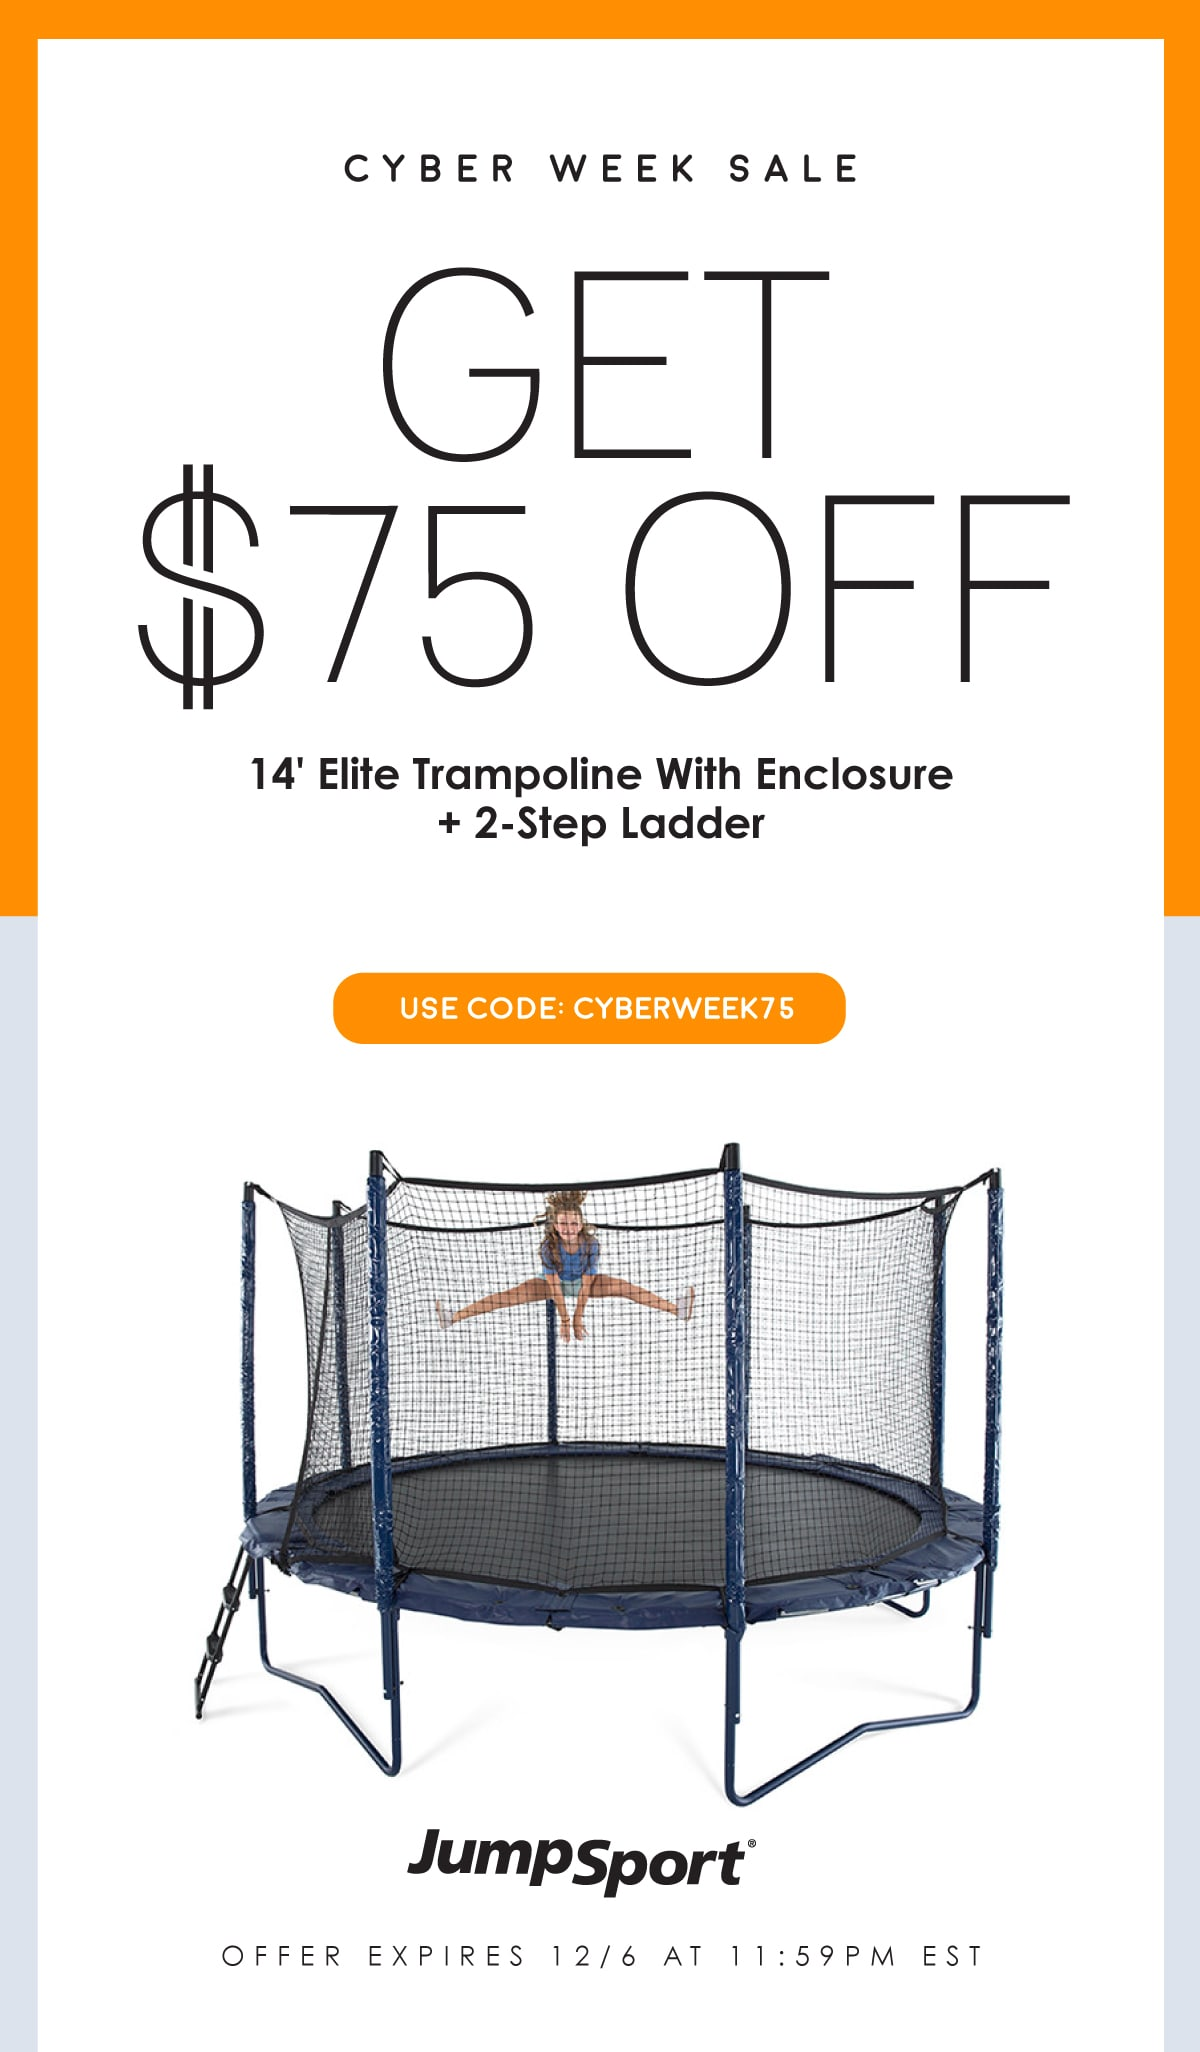 Backyard Cyber Week Sale